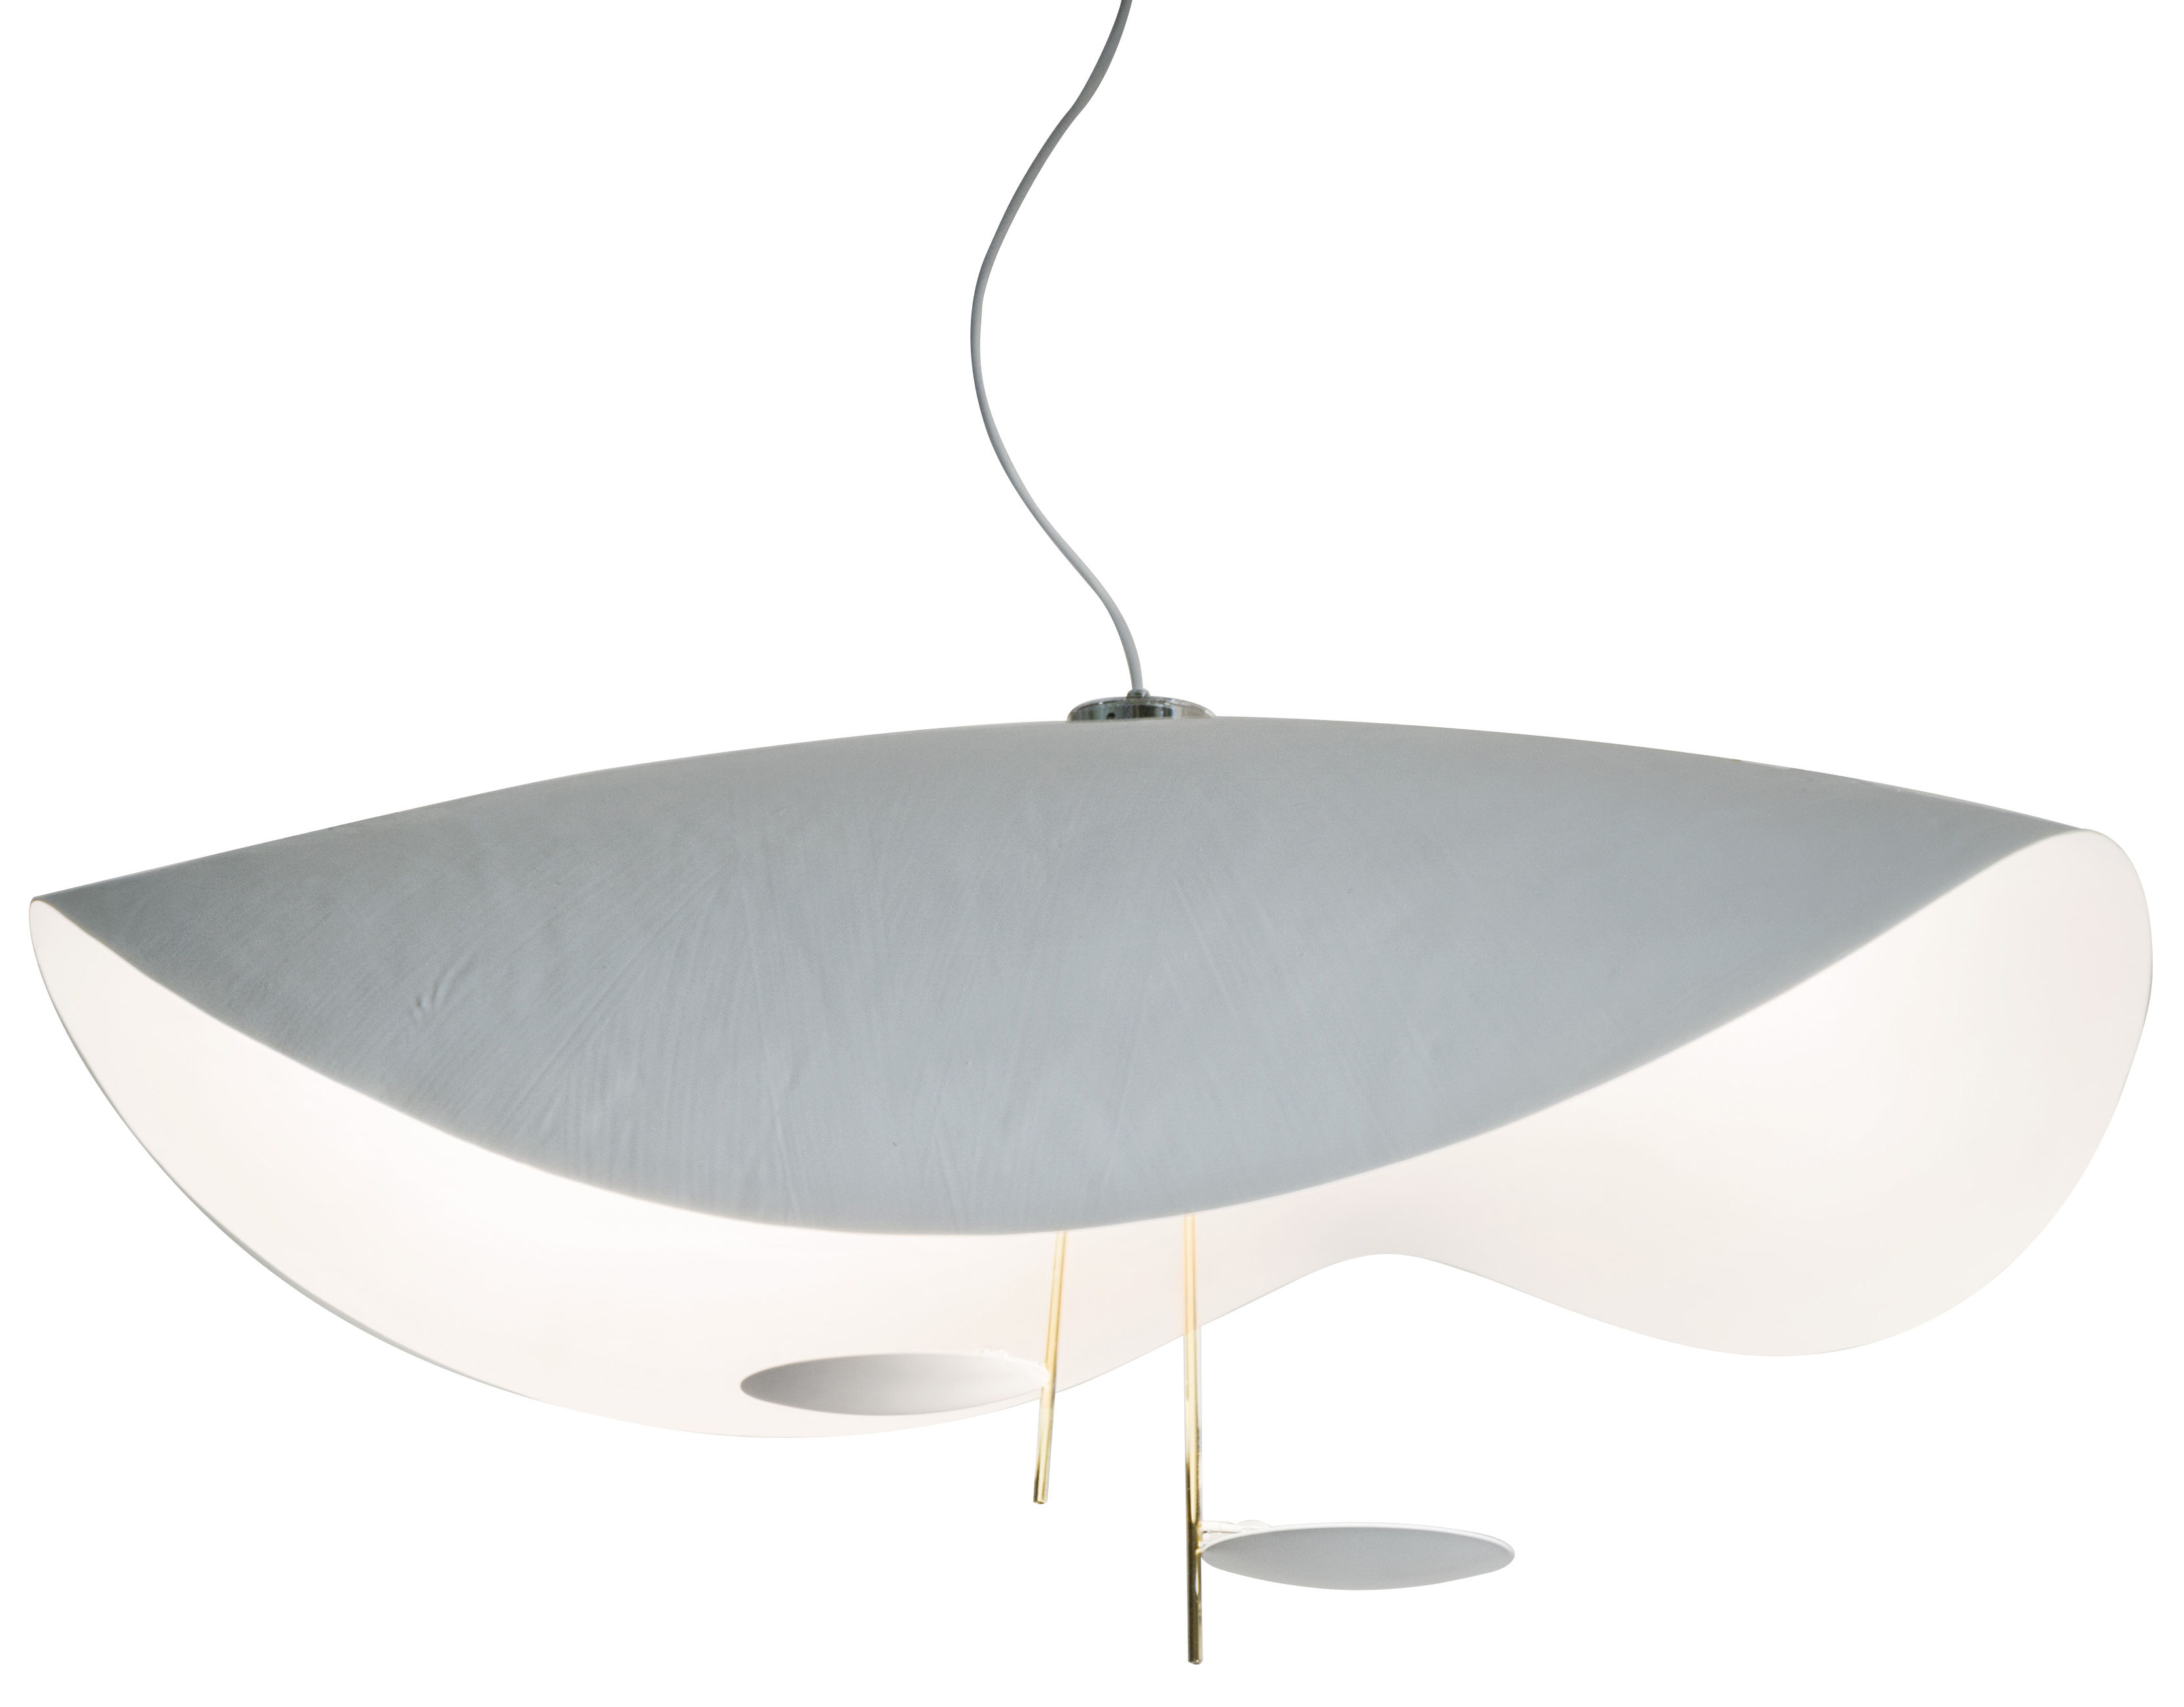 Lighting - Pendant Lighting - Lederam S2 Pendant by Catellani & Smith - White and gold - Fibreglass, Golden metal, Painted aluminium